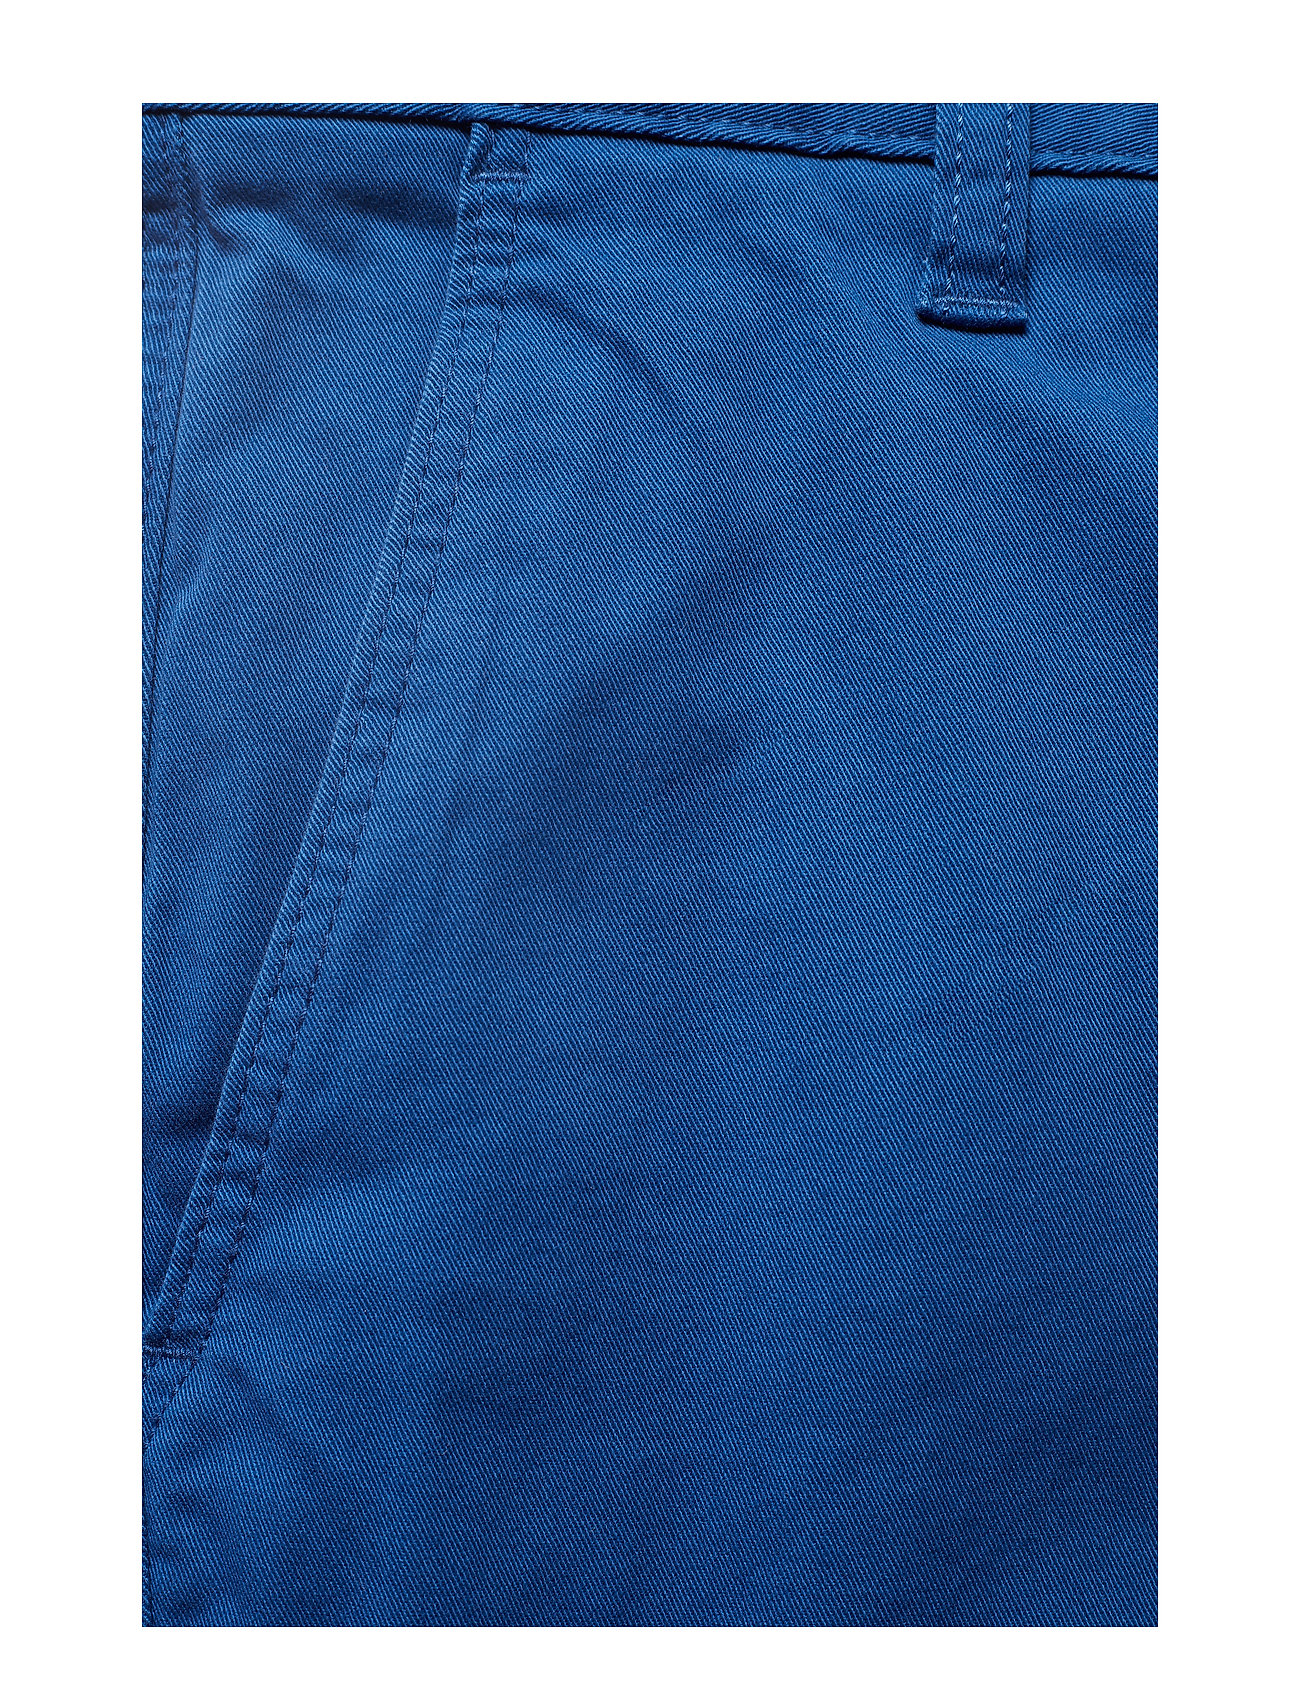 Essential ChinolimogesTommy Jeans Jeans Tjm ChinolimogesTommy Essential Tjm SUMGqzpV